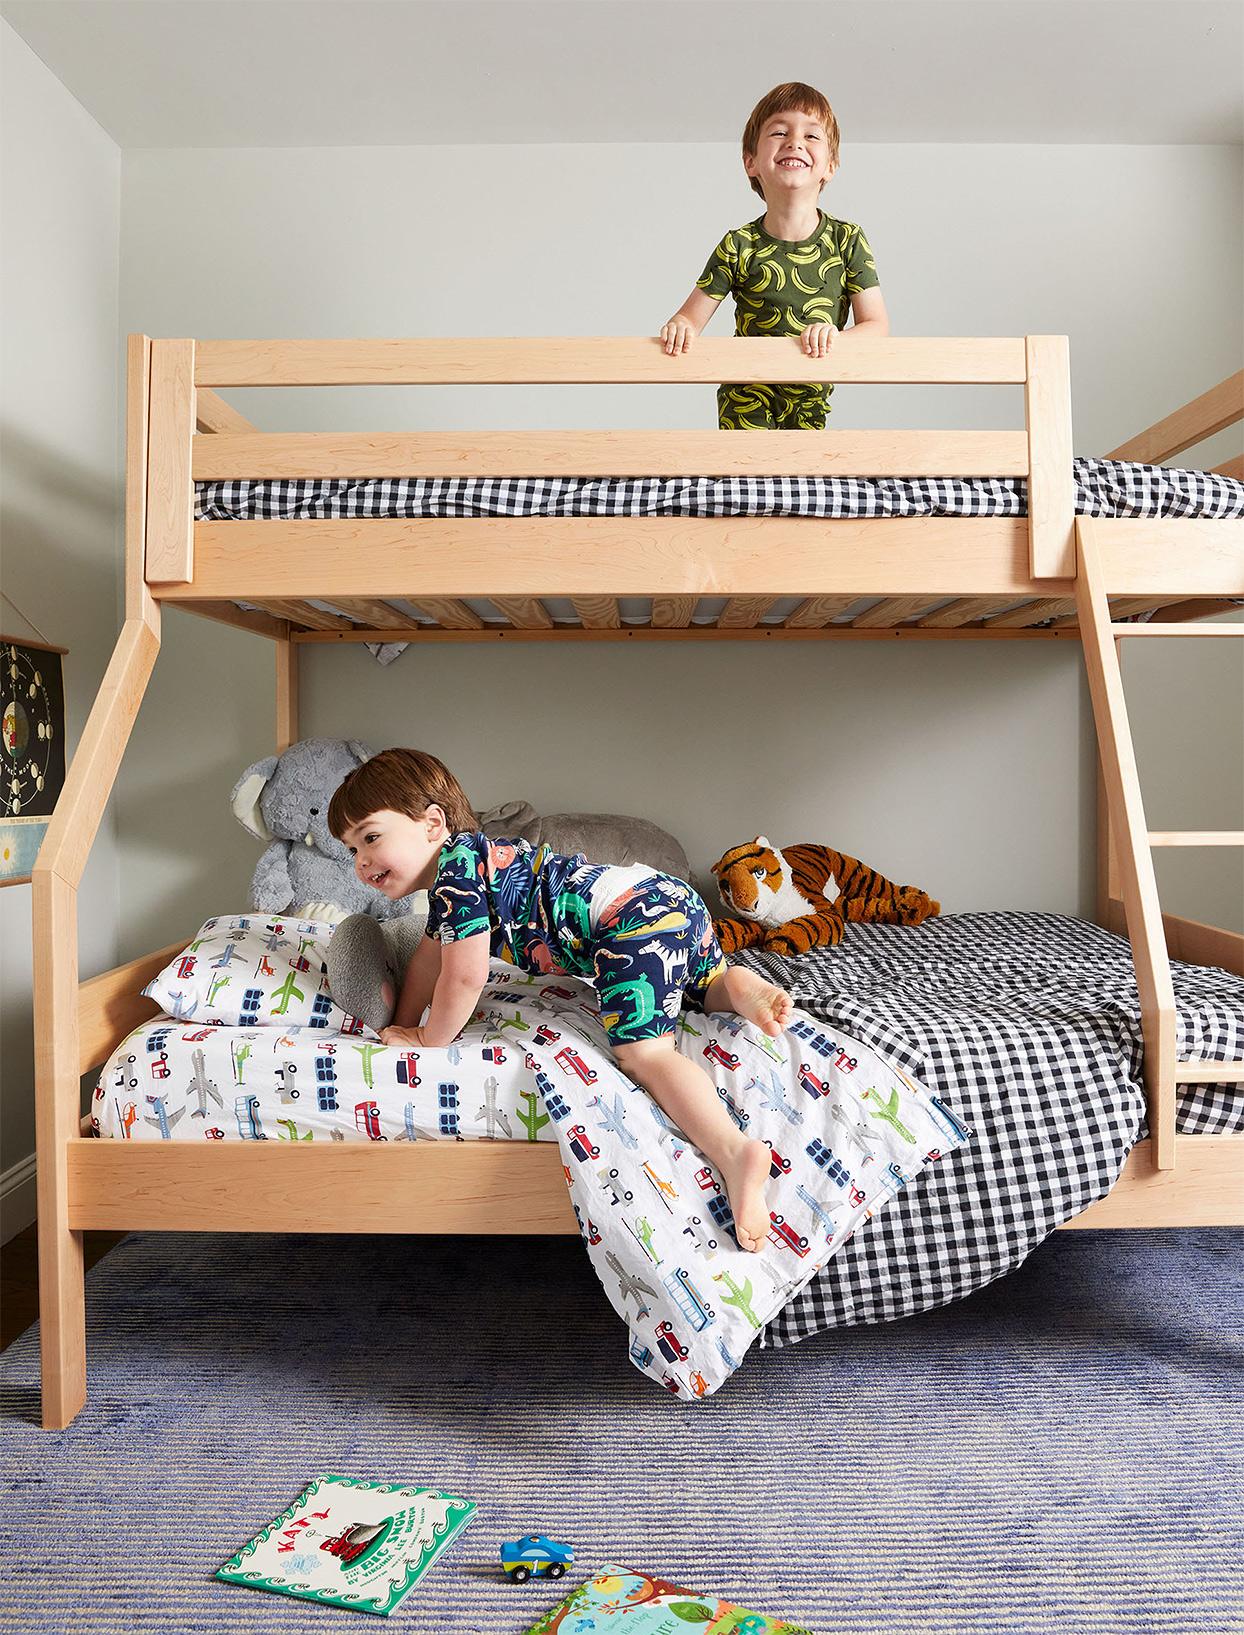 young boys in pajamas in bunk bead